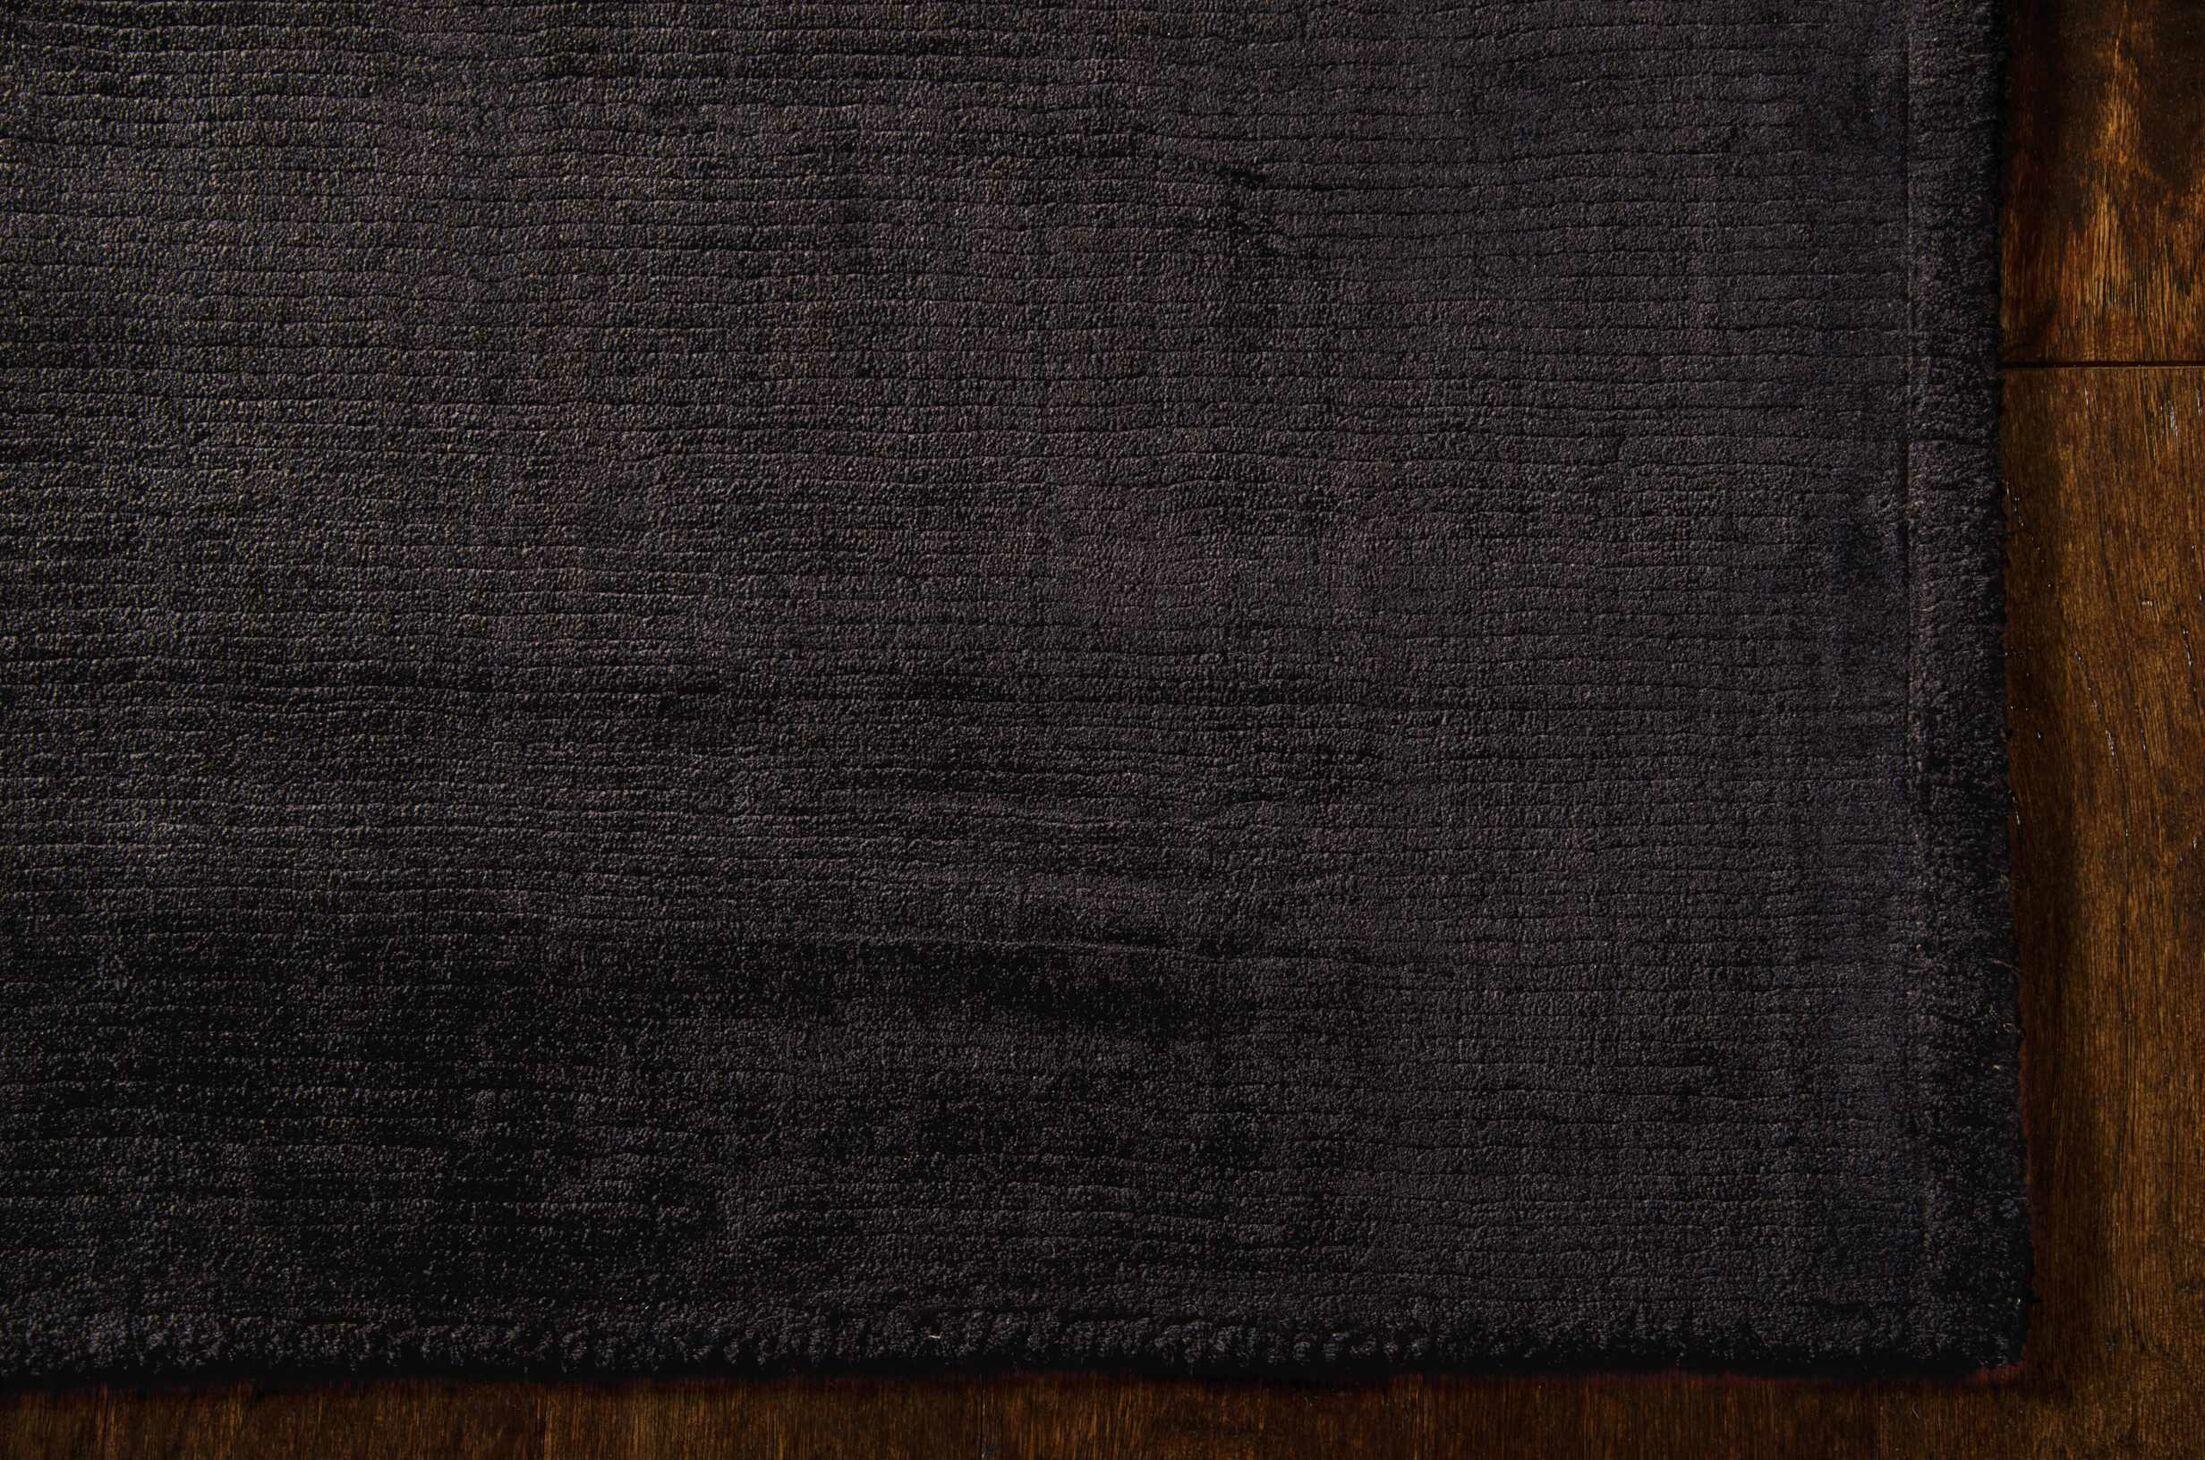 Lunar Hand-Woven Obsidian Area Rug Rug Size: Rectangle 9'6